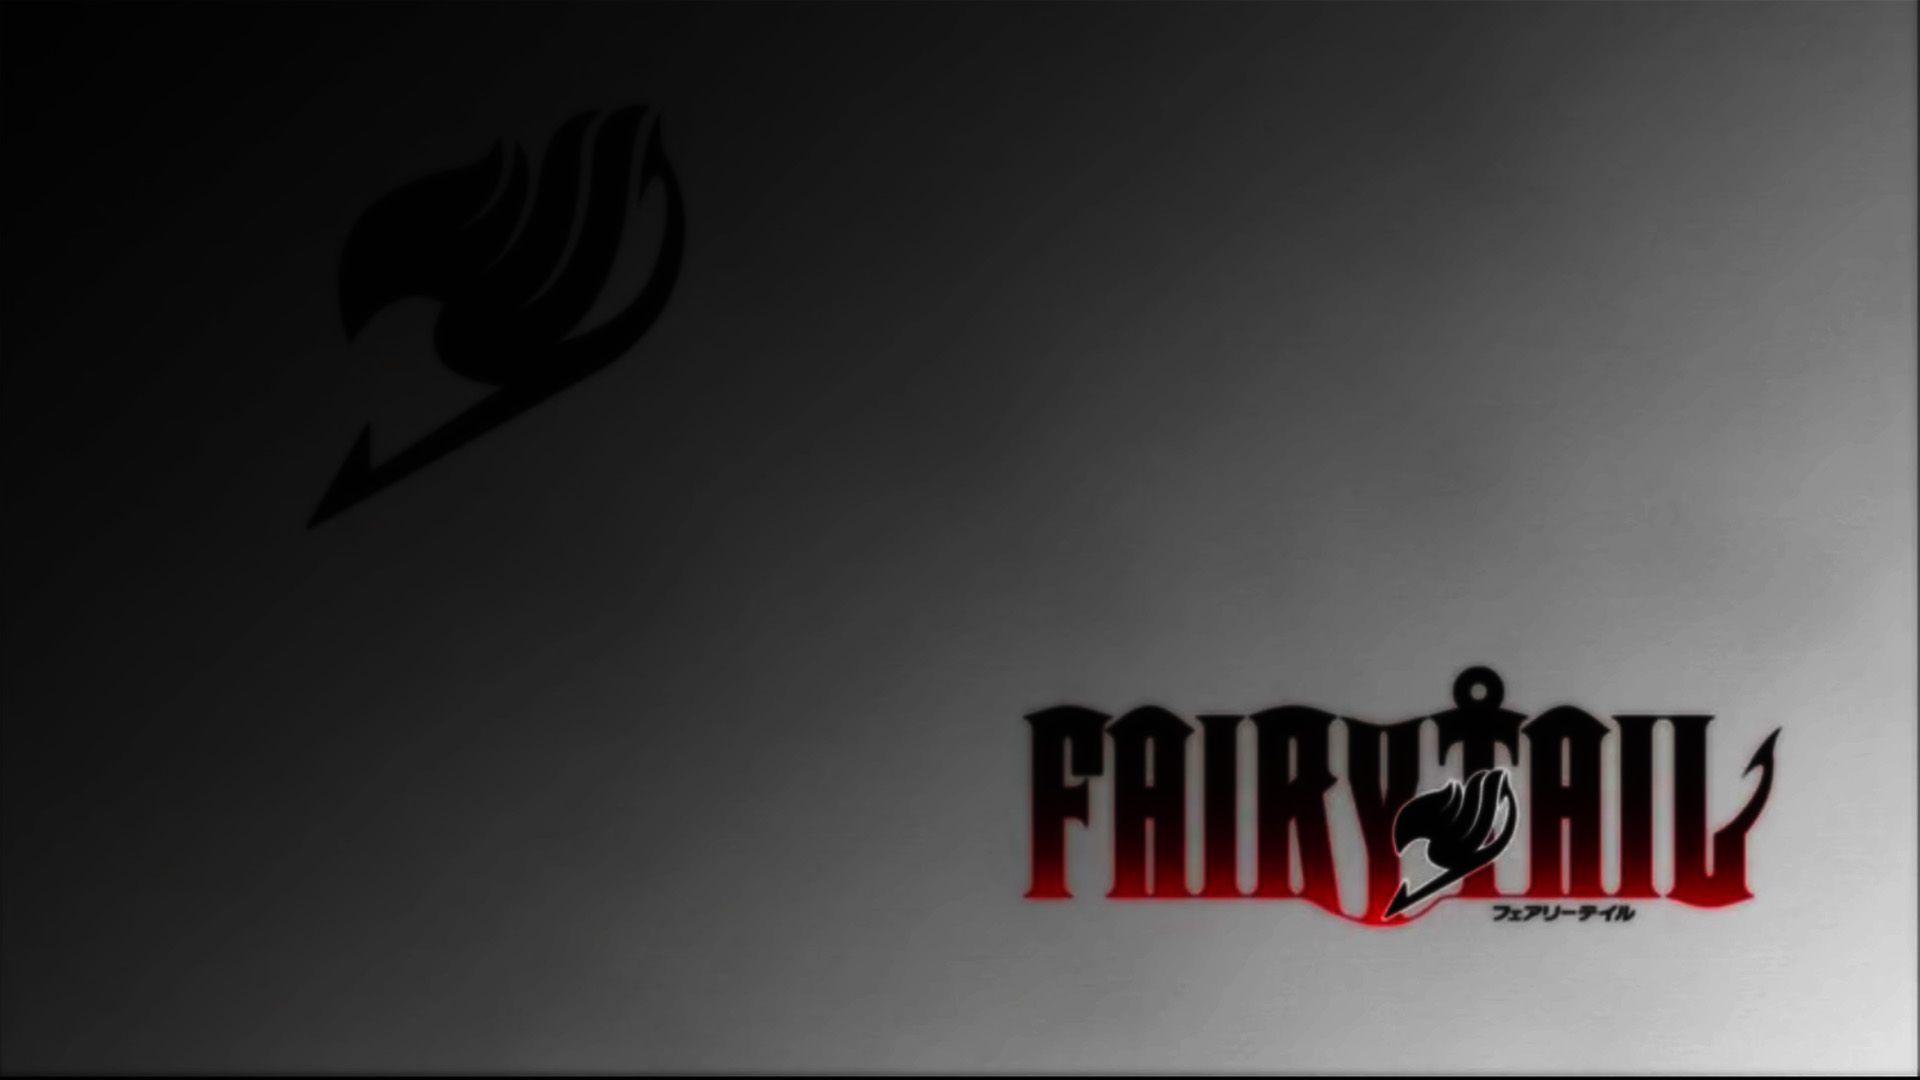 Fairy Tail Logo Wallpaper Hd Wallpapers Pinterest Wallpaper